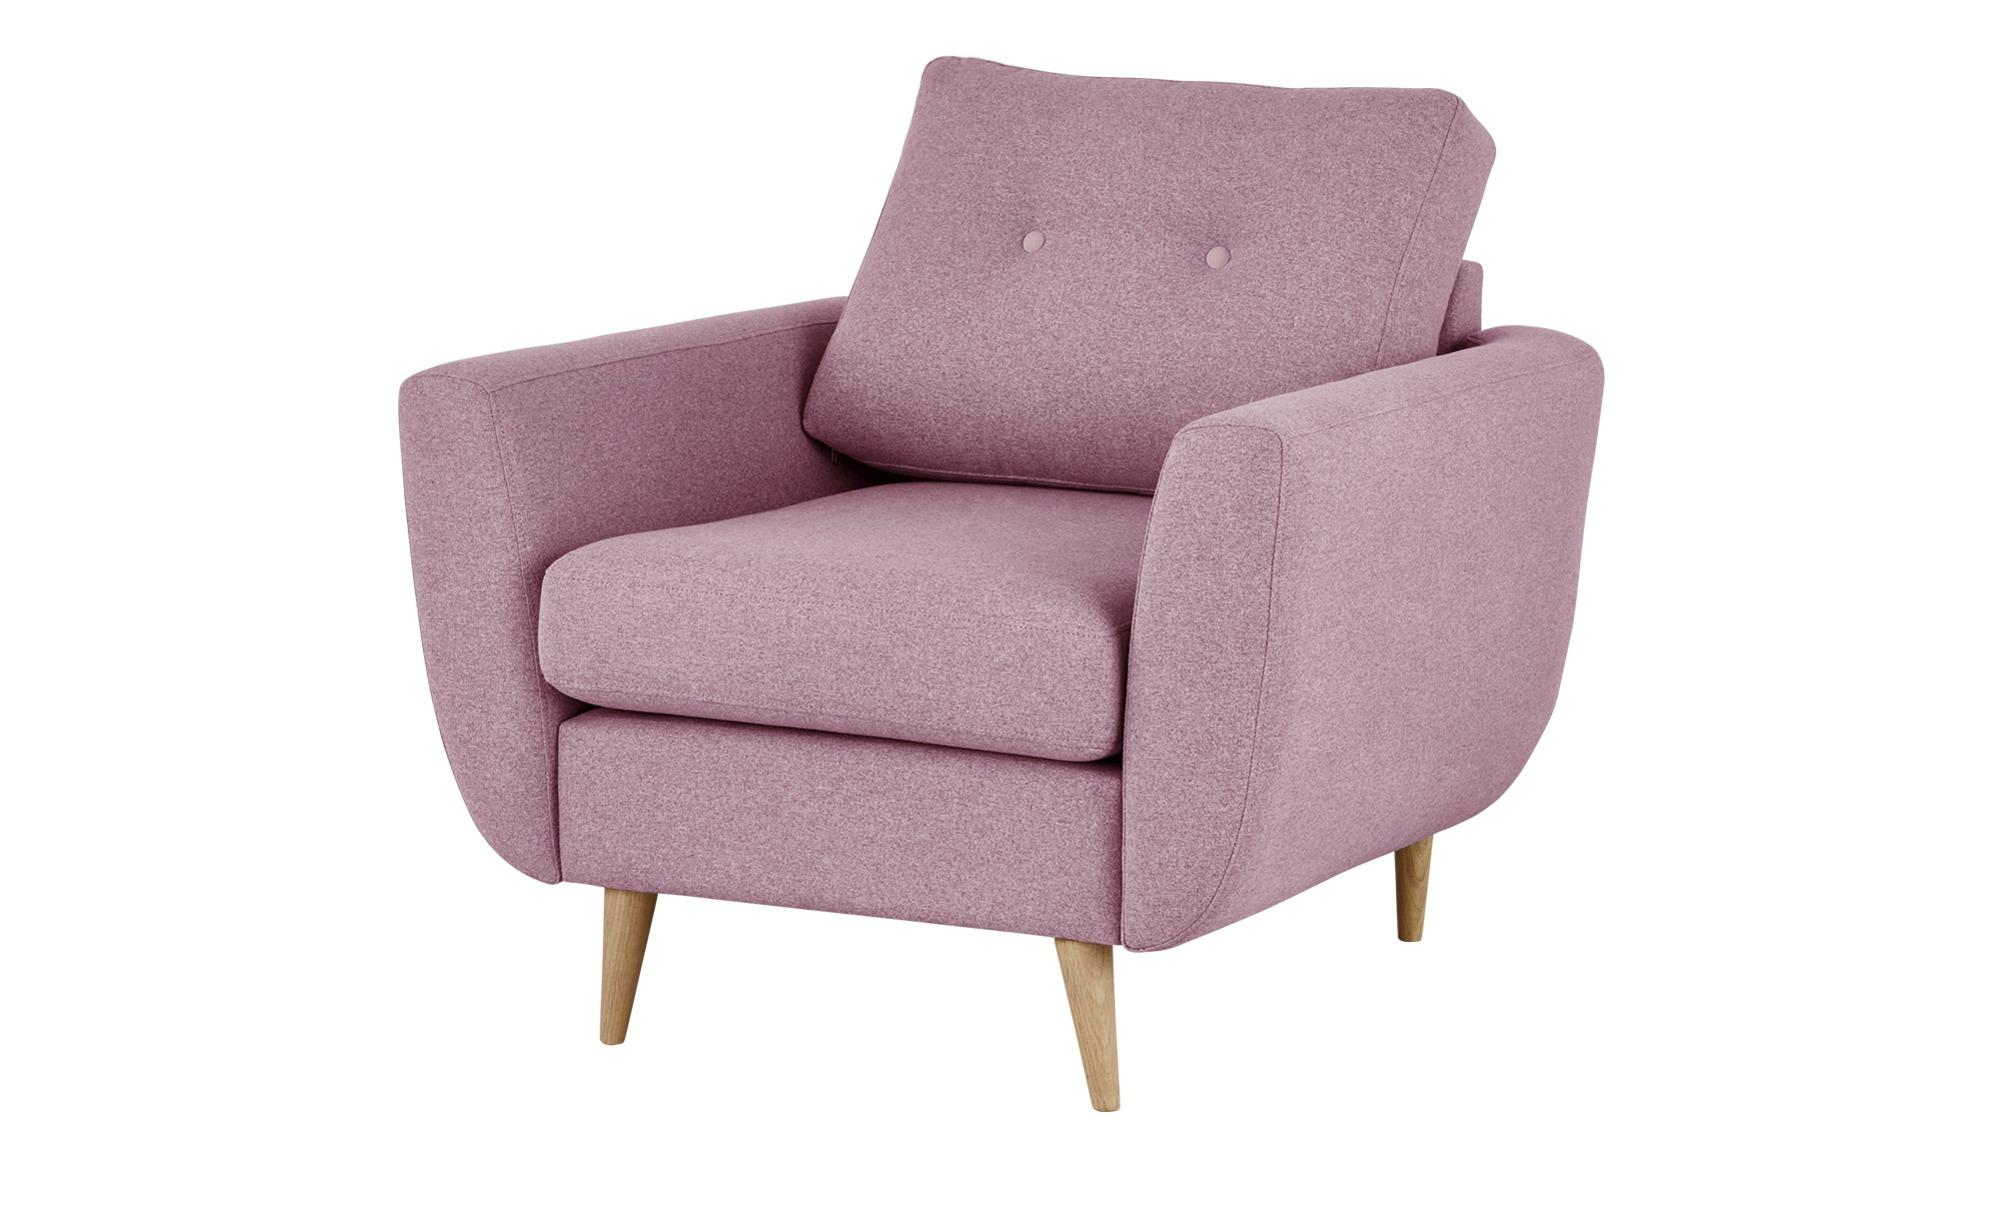 finya Retro-Sessel rosa - Stoff Harris ¦ rosa/pink ¦ Maße (cm): B: 88 H: 85 T: 85 Polstermöbel > Sessel > Polstersessel - Höffner